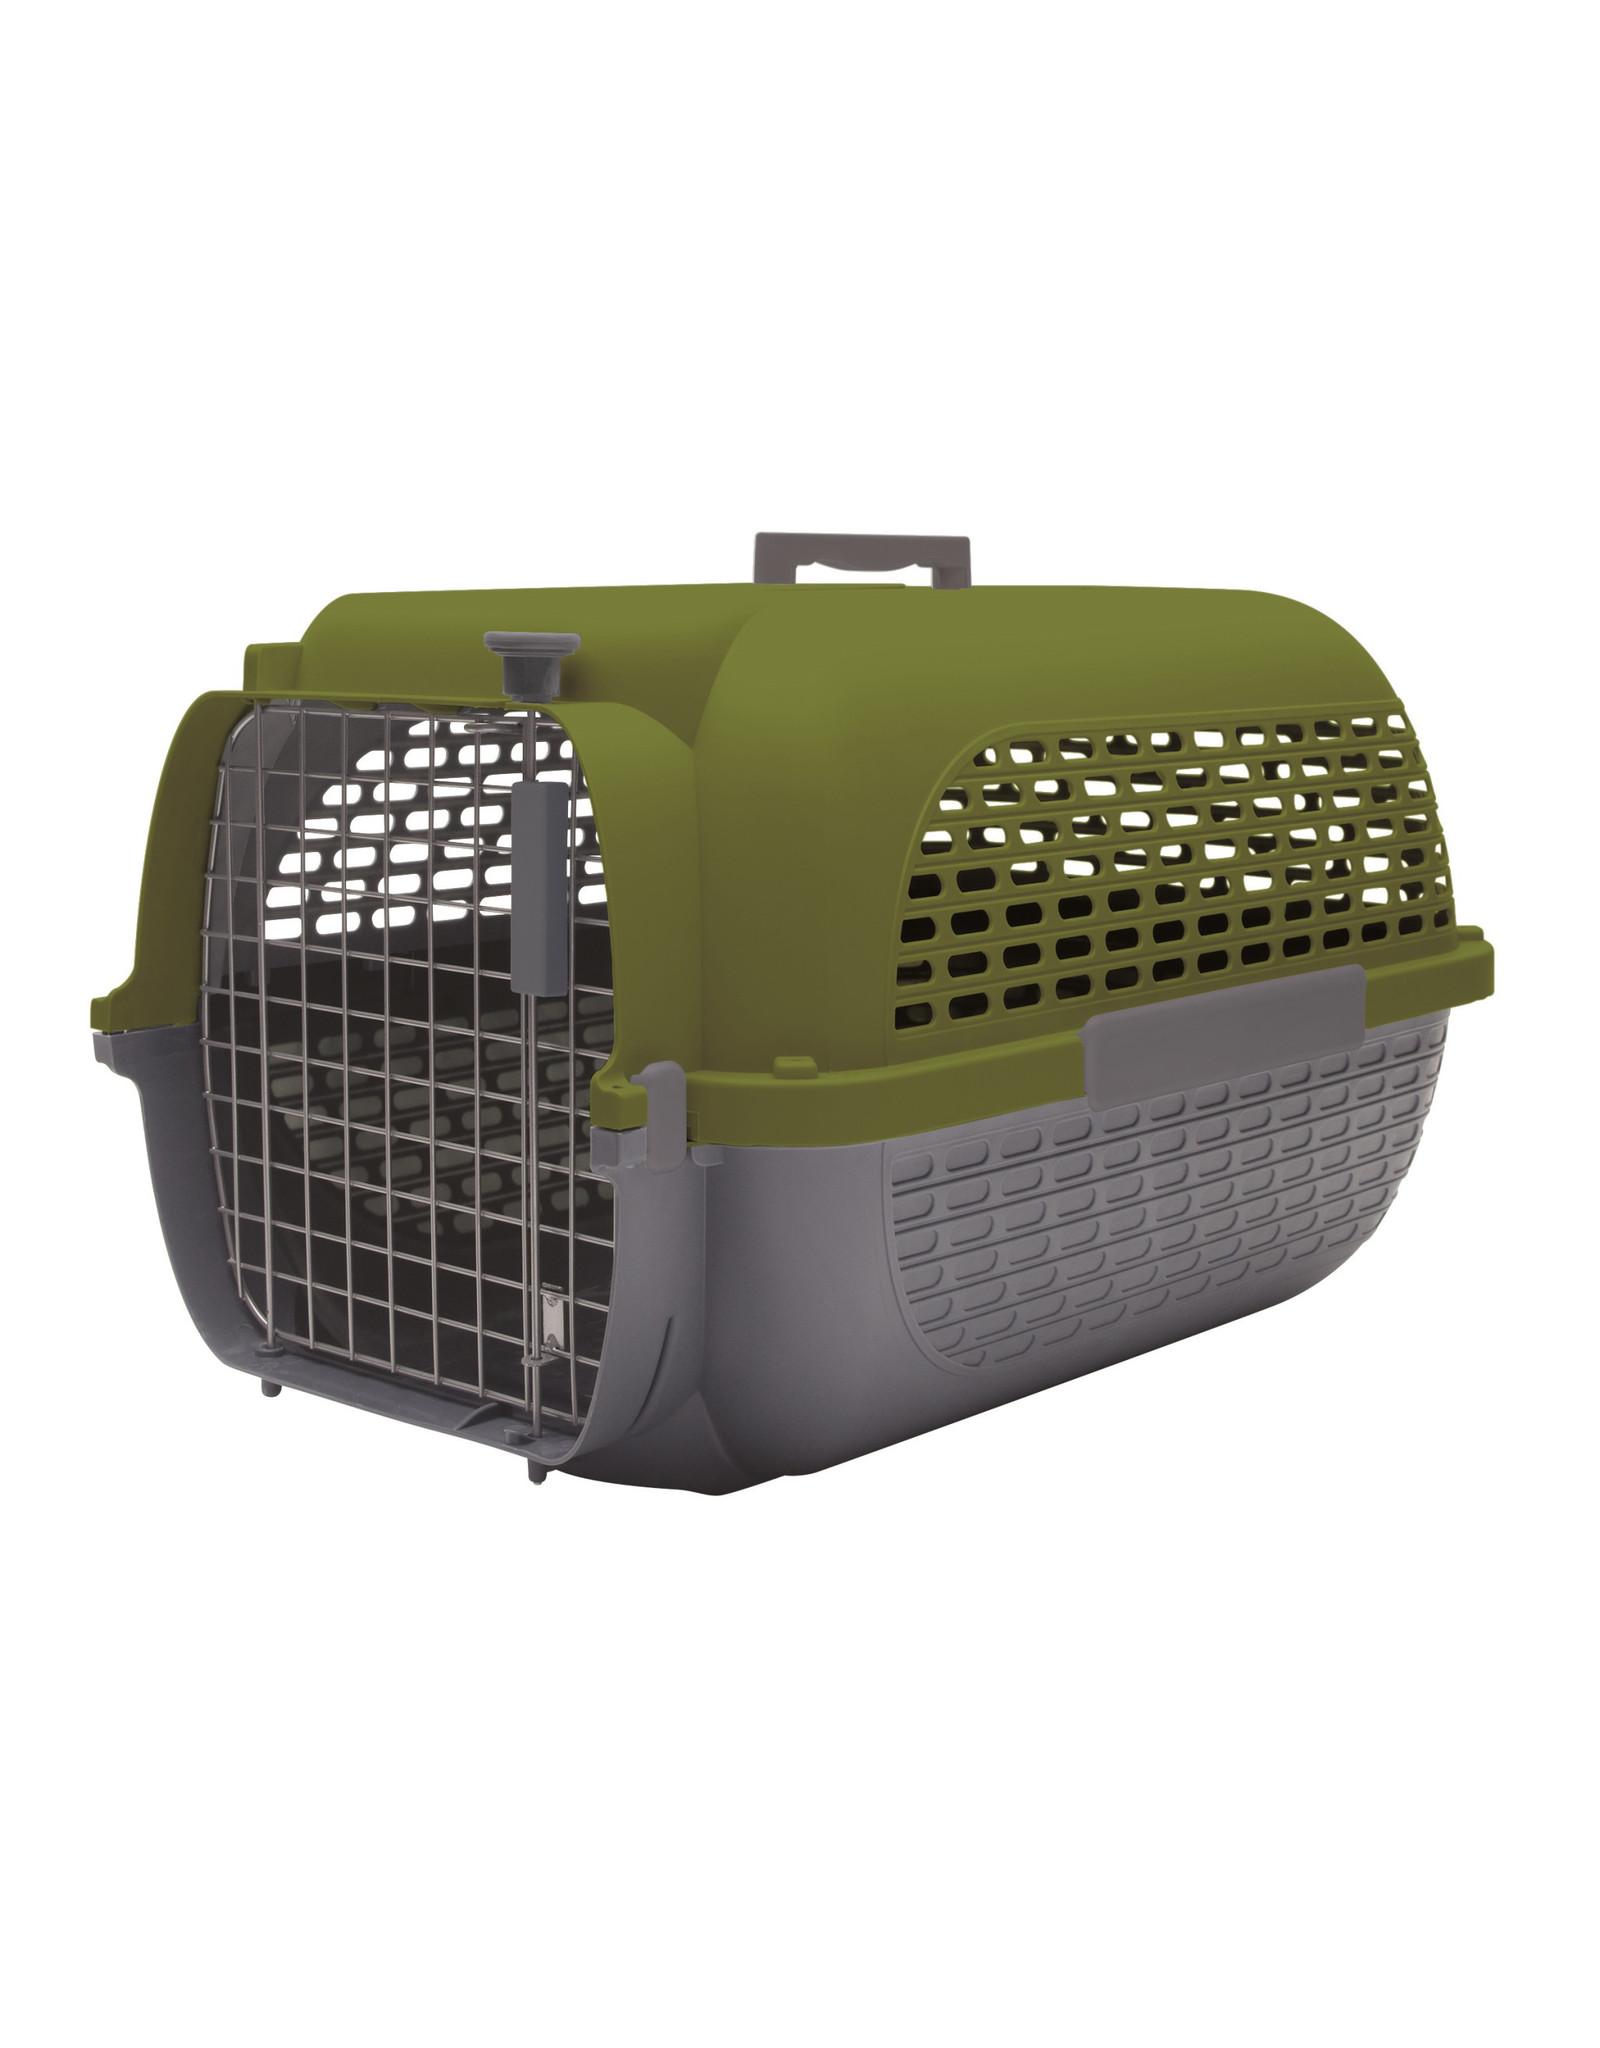 "DogIt Voyageur Dog Carrier Khaki/Charcoal XLarge 68.4L x 47.6W x 43.8cmH (26.9x18.7x17"")"